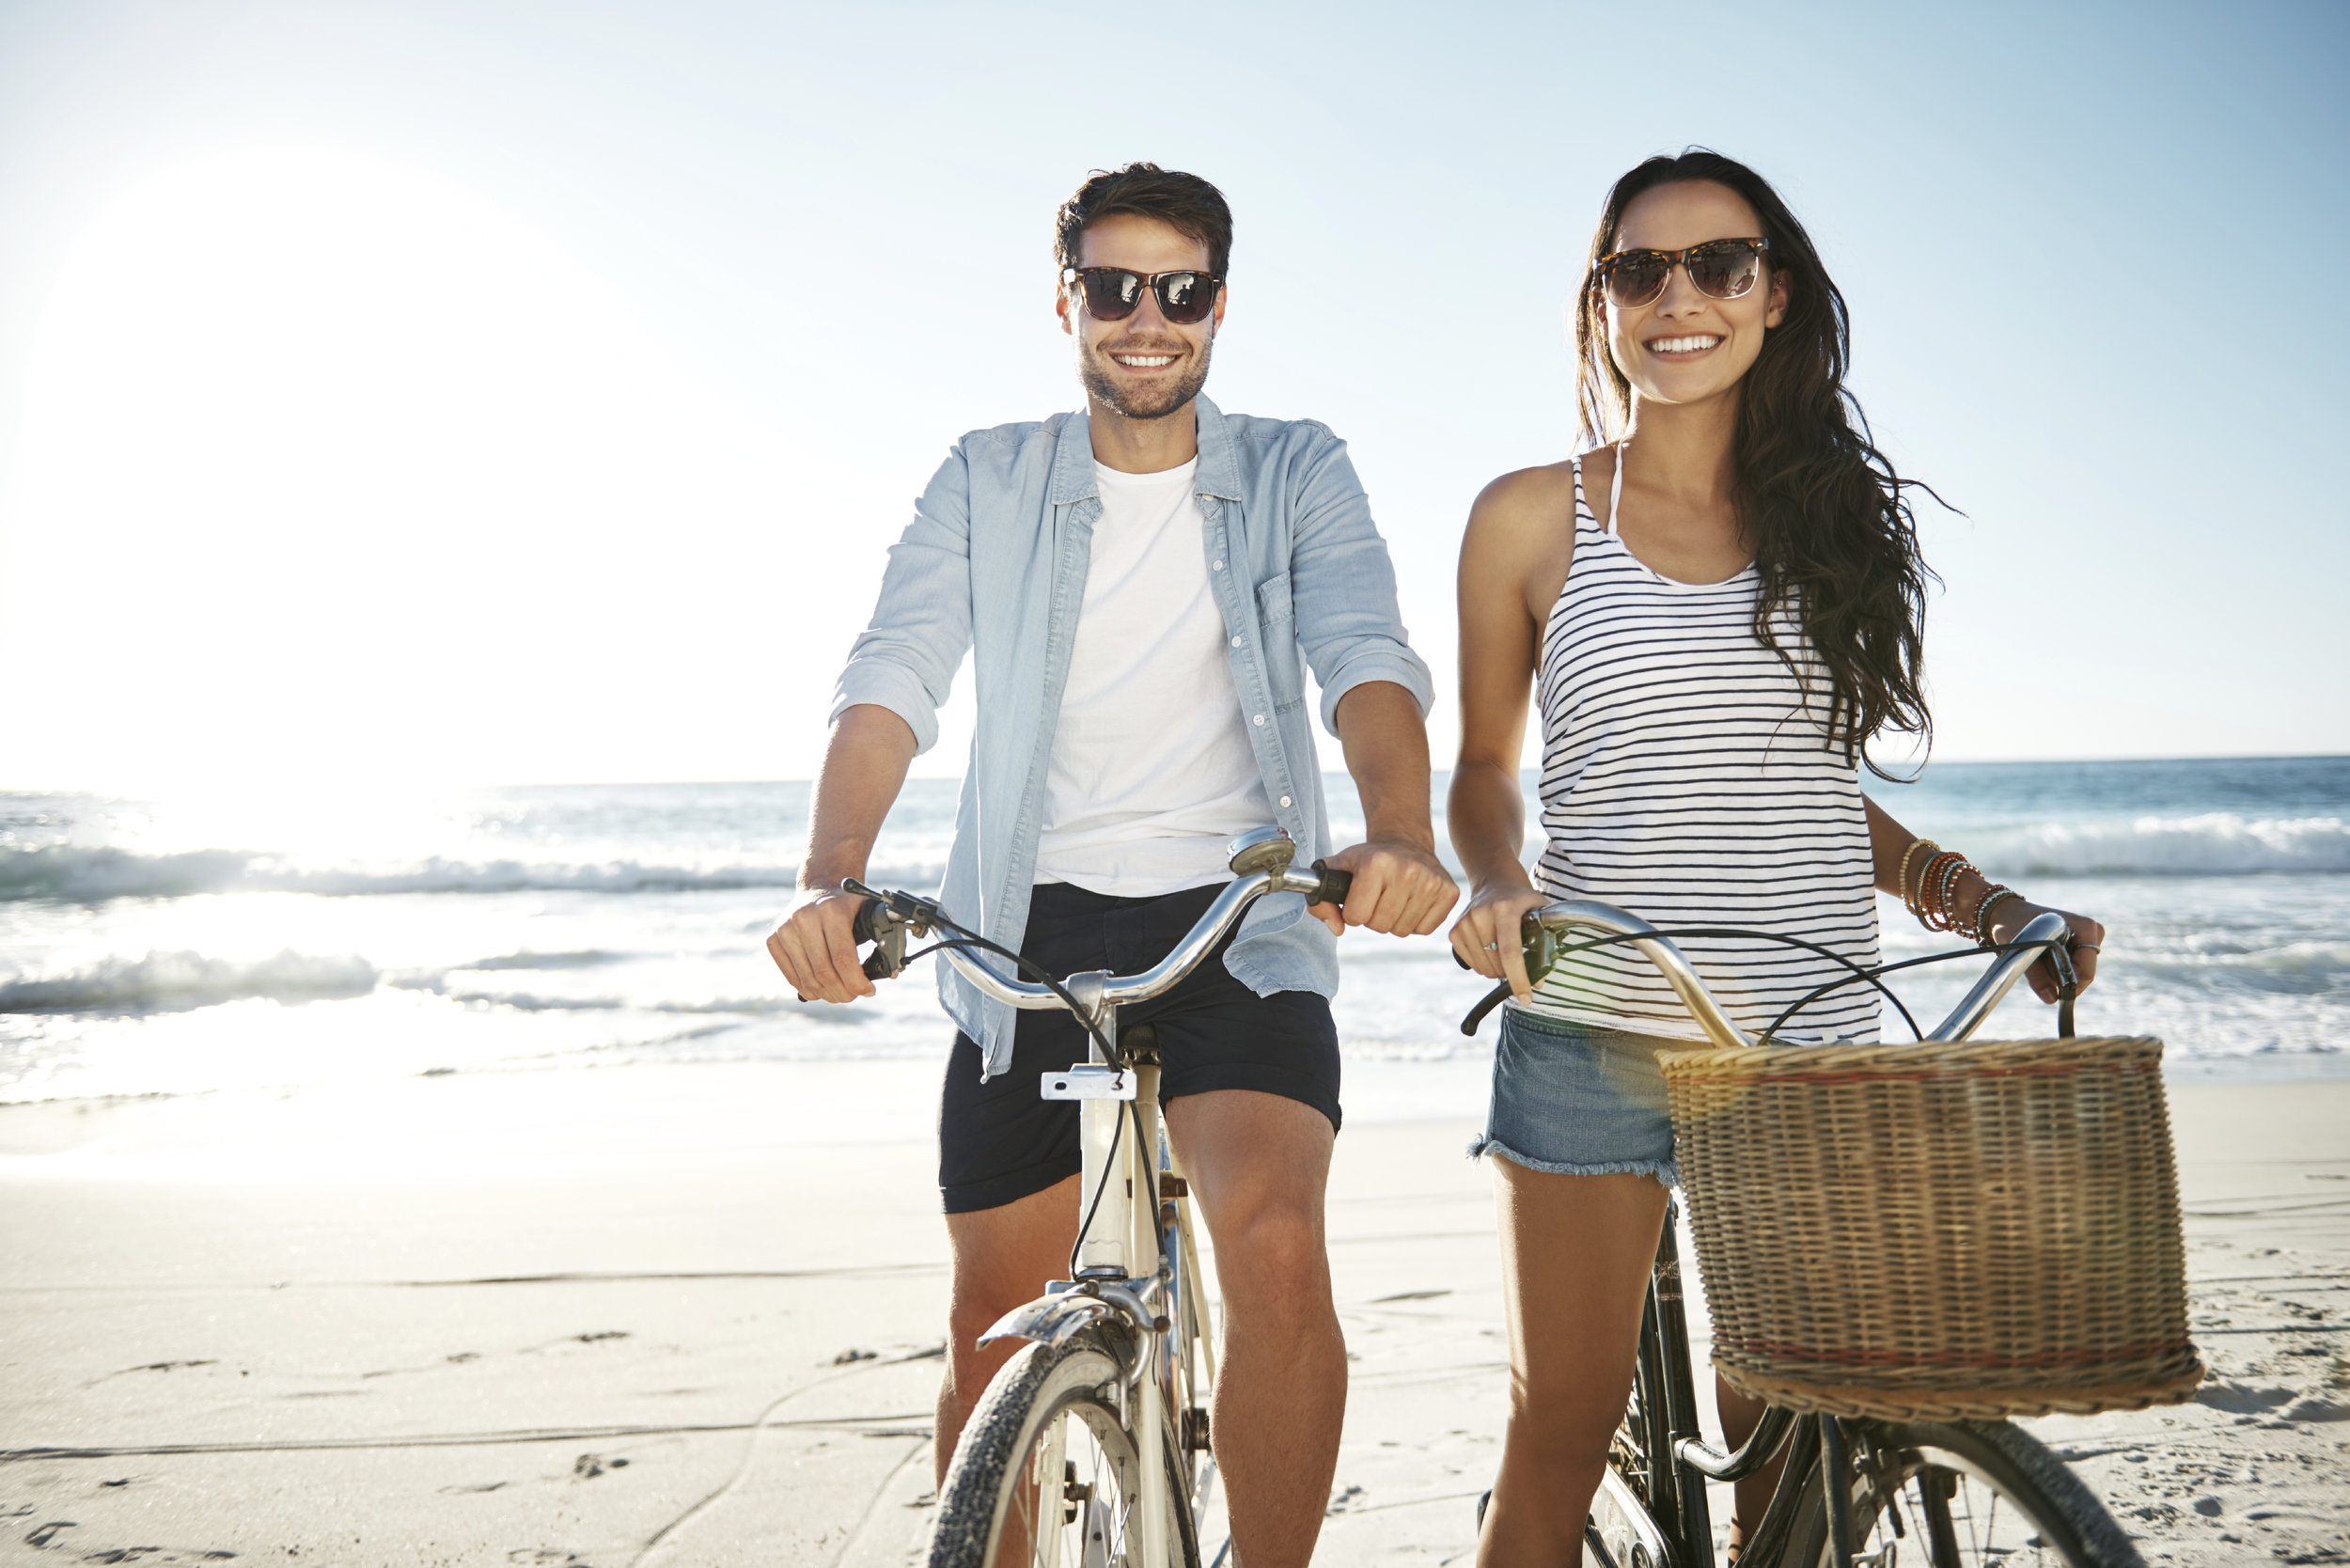 Green's Bicyle rentals